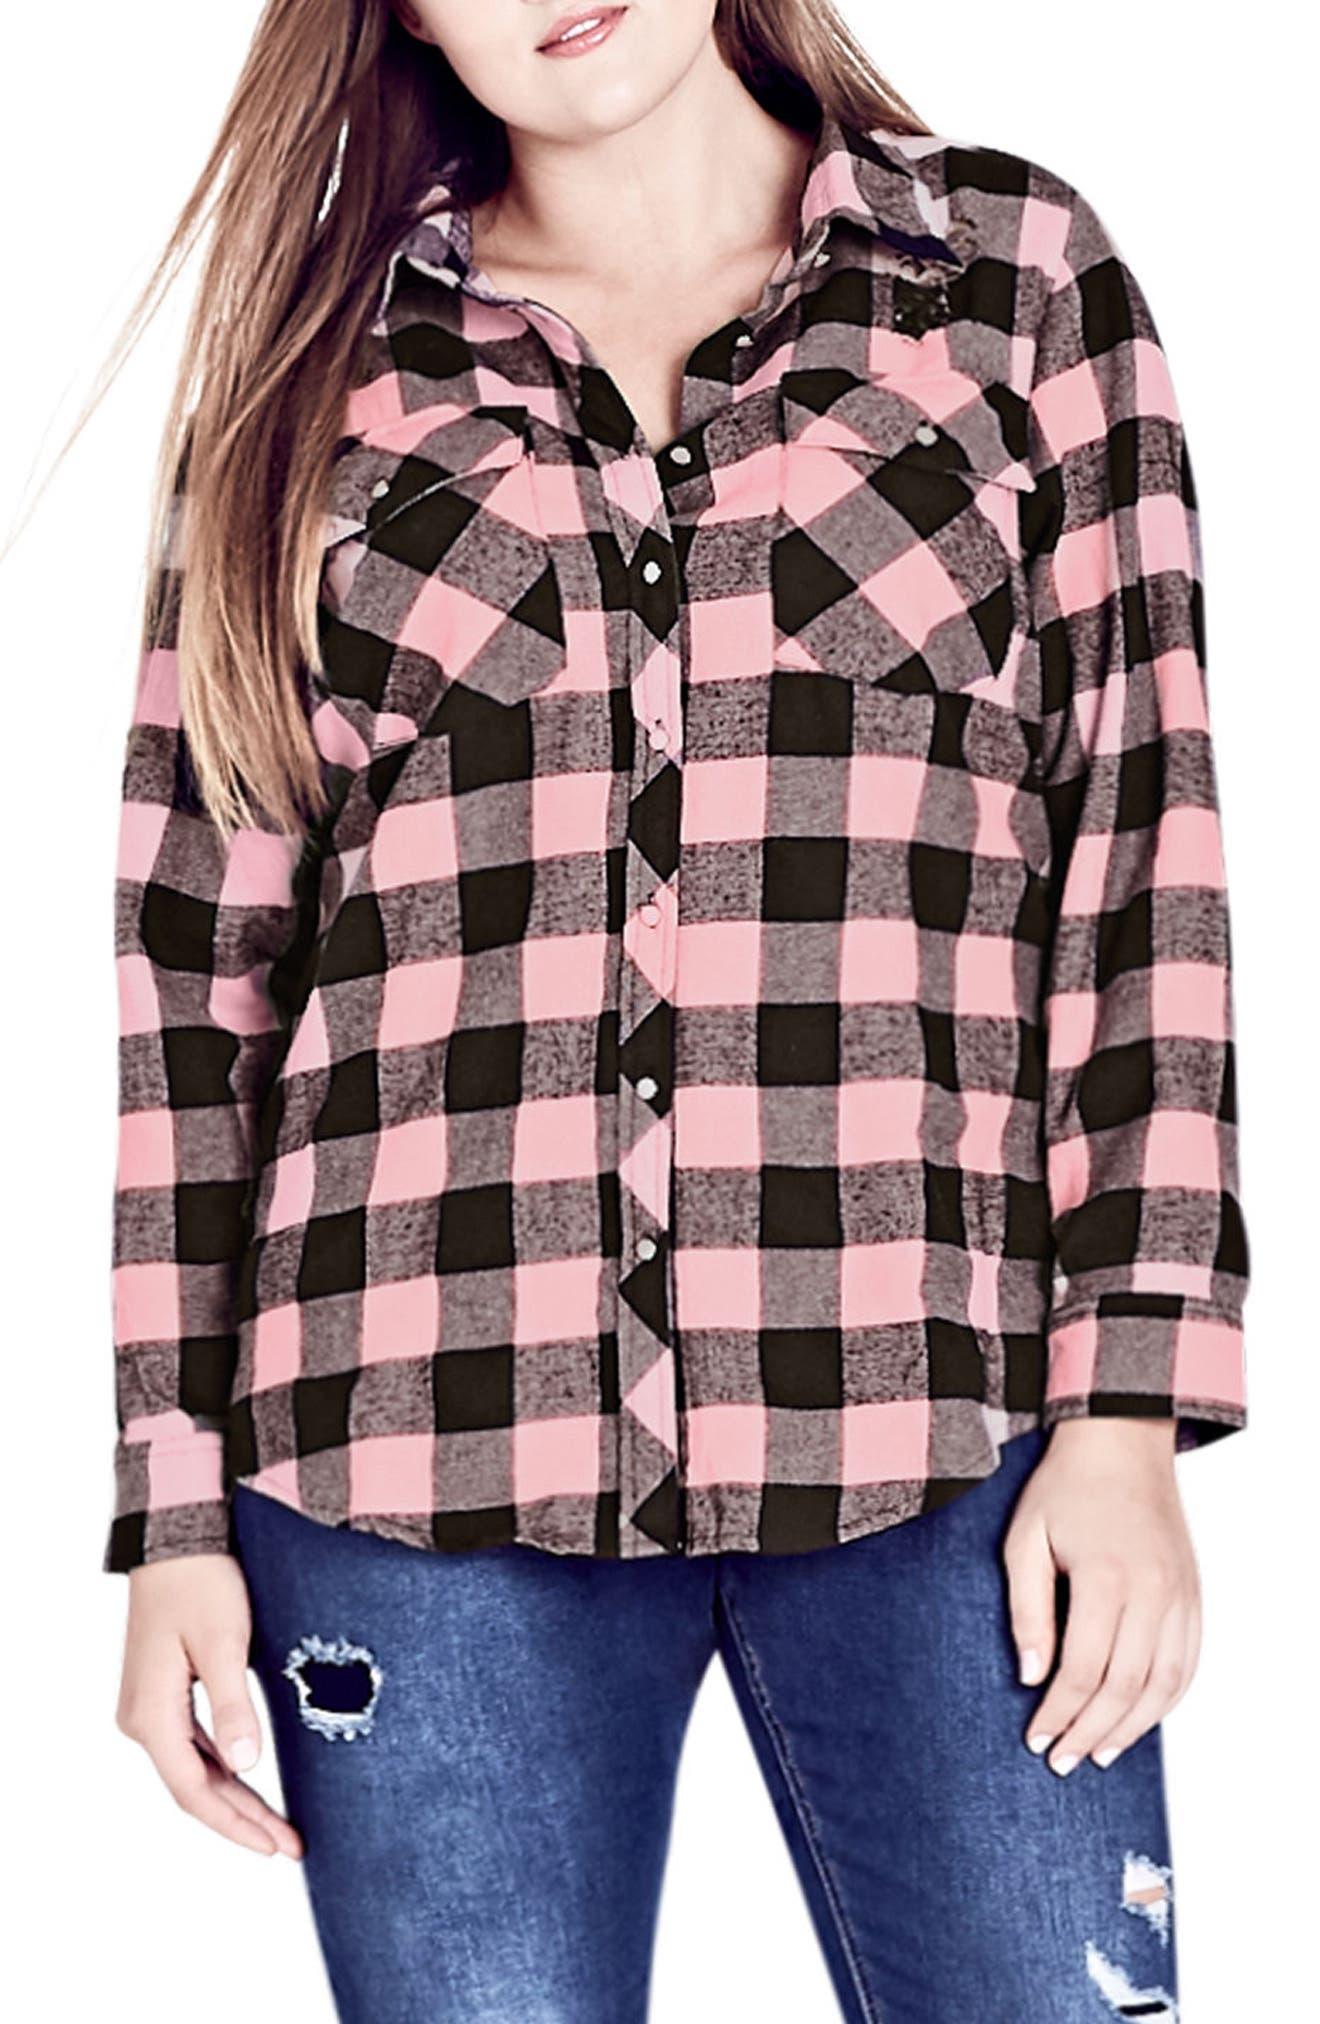 Dusty Duke Cotton Shirt,                             Main thumbnail 1, color,                             Blush Pink